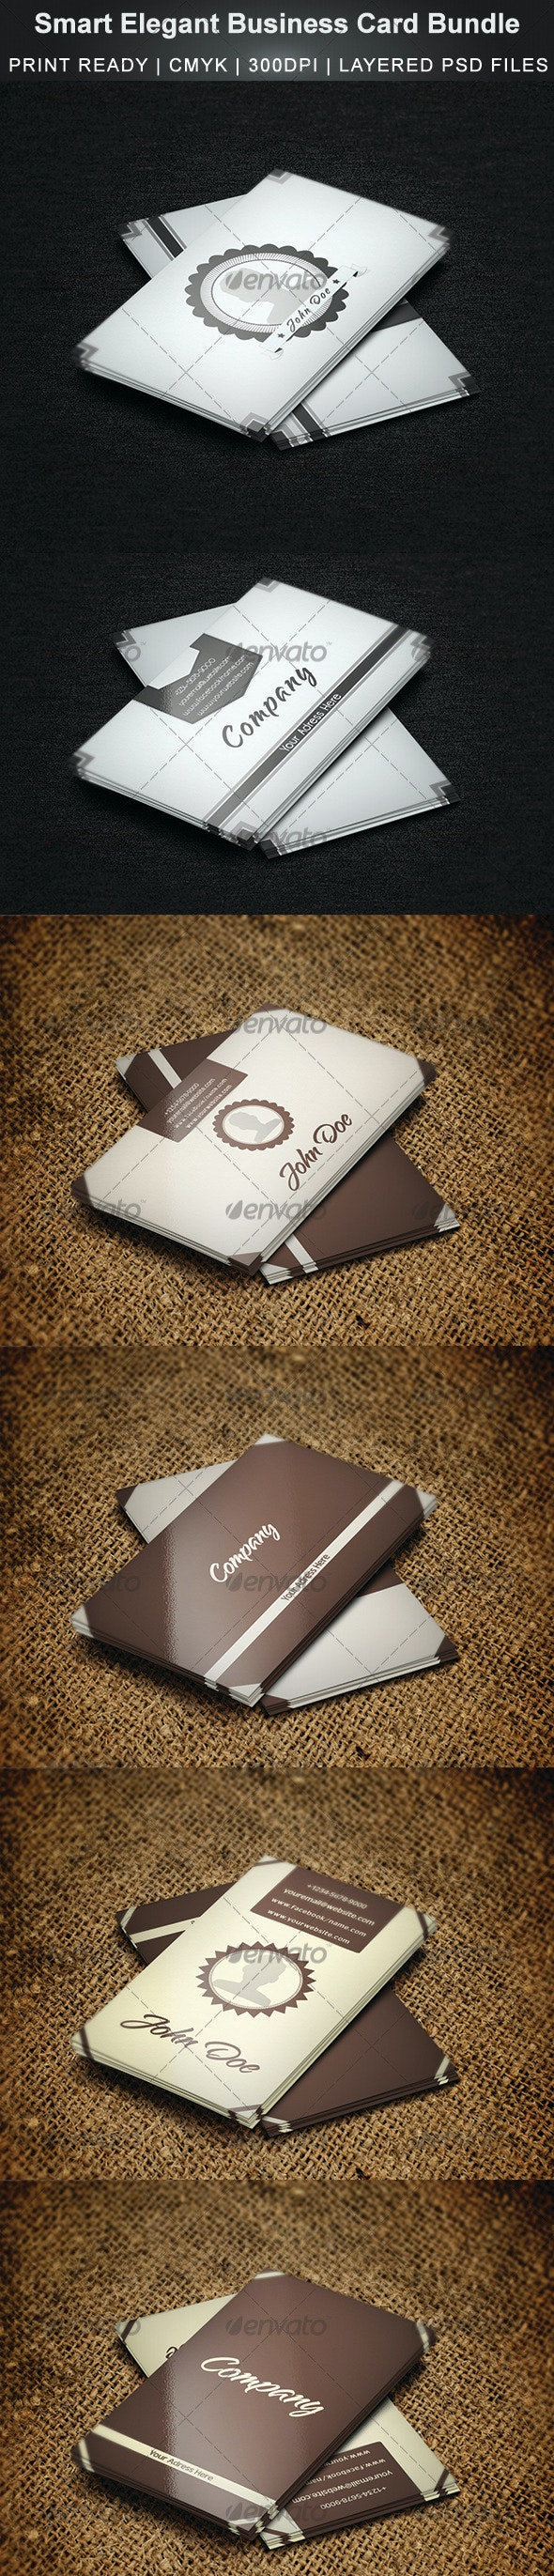 Smart & Elegant Business Card Bundle - Creative Business Cards